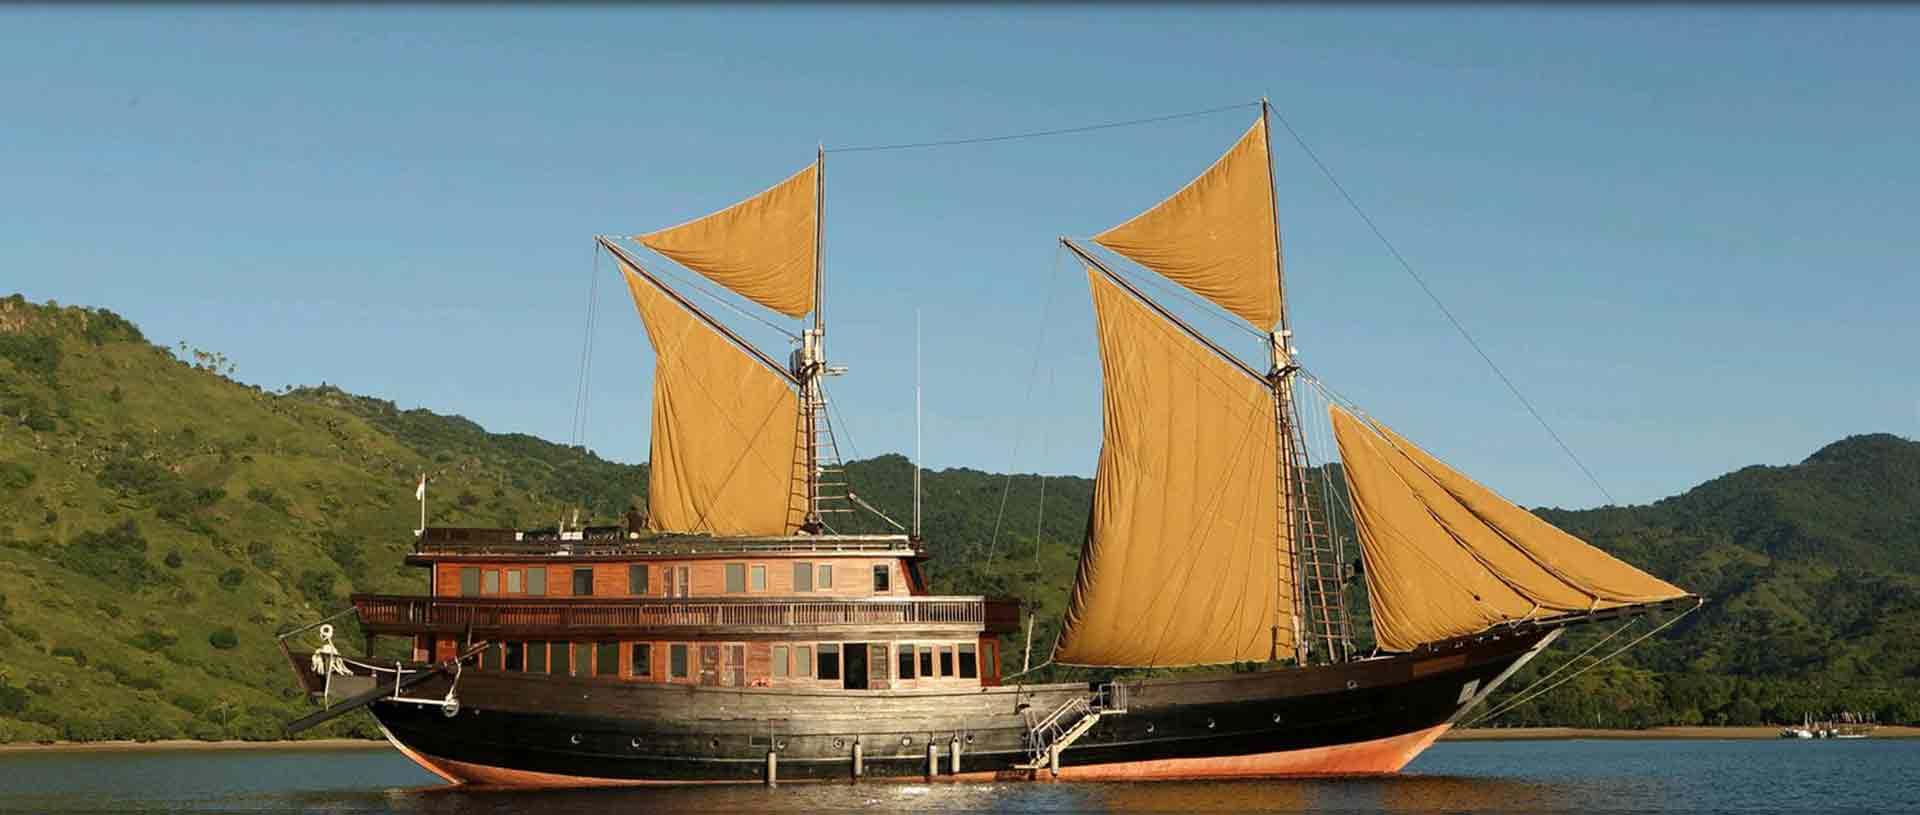 Alila Purnama Cruise